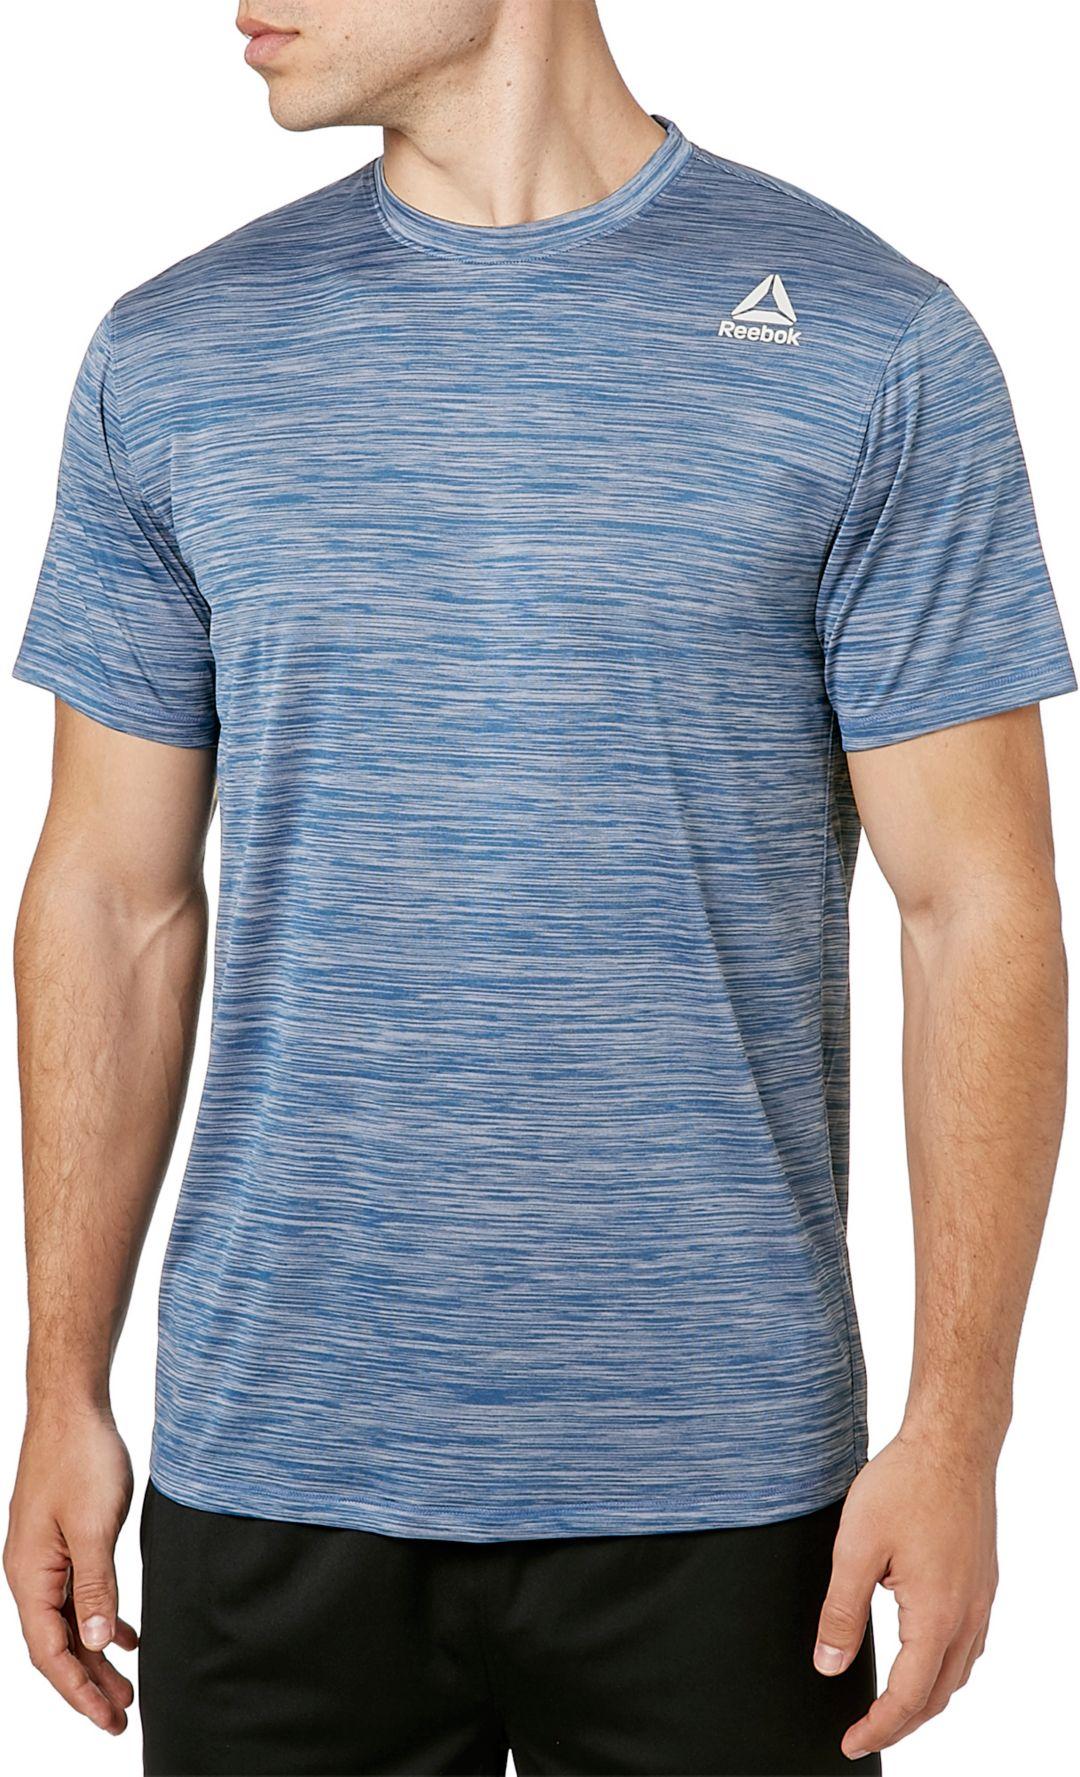 0eec2f6b6 Reebok Men's Spacedye Performance T-Shirt | DICK'S Sporting Goods